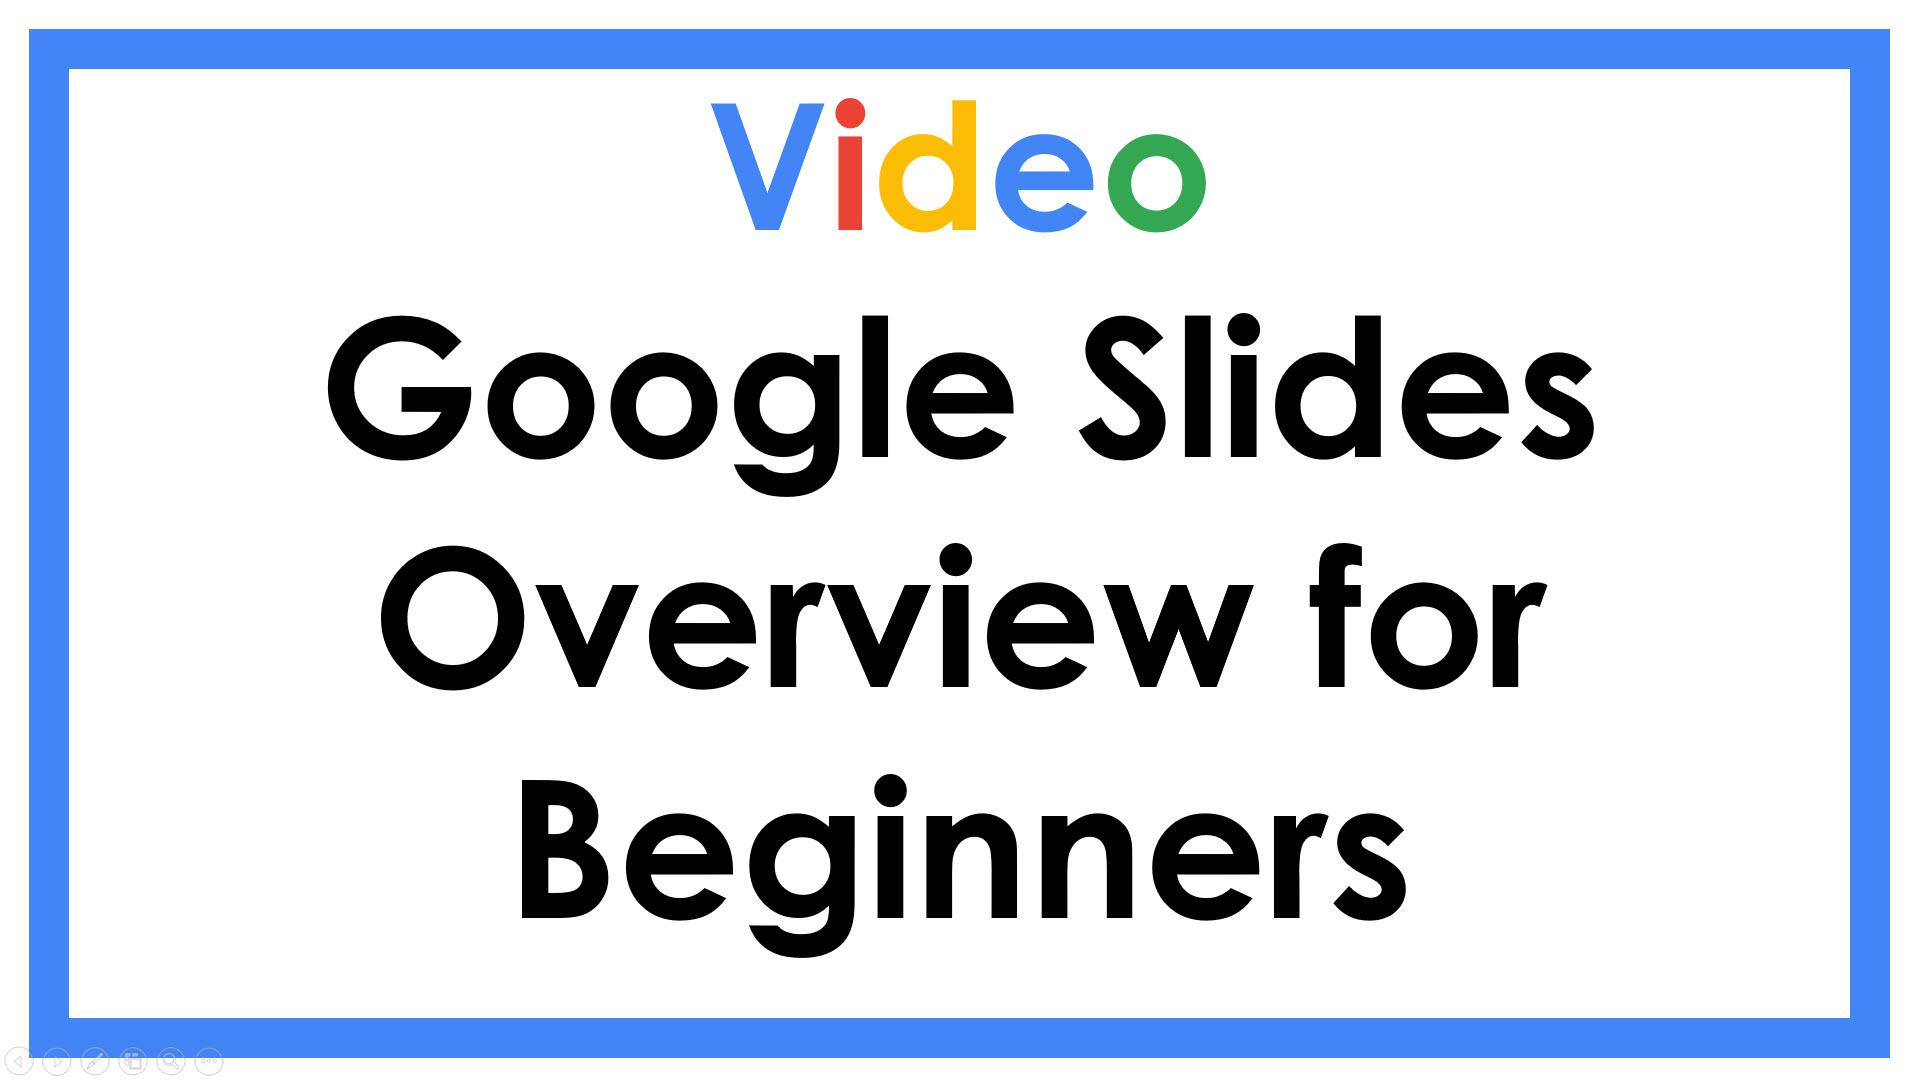 Google Slides Overview for Beginners